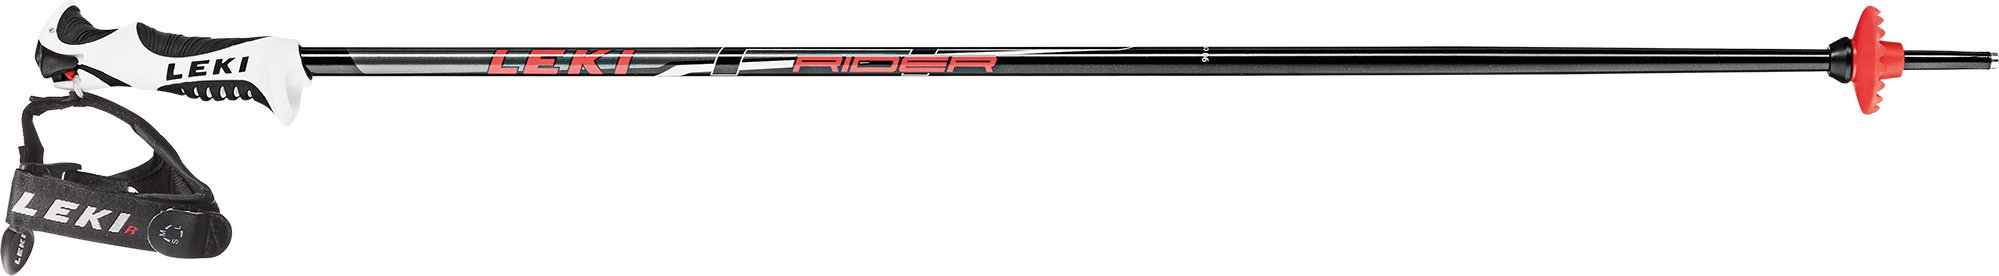 Leki Rider S 85